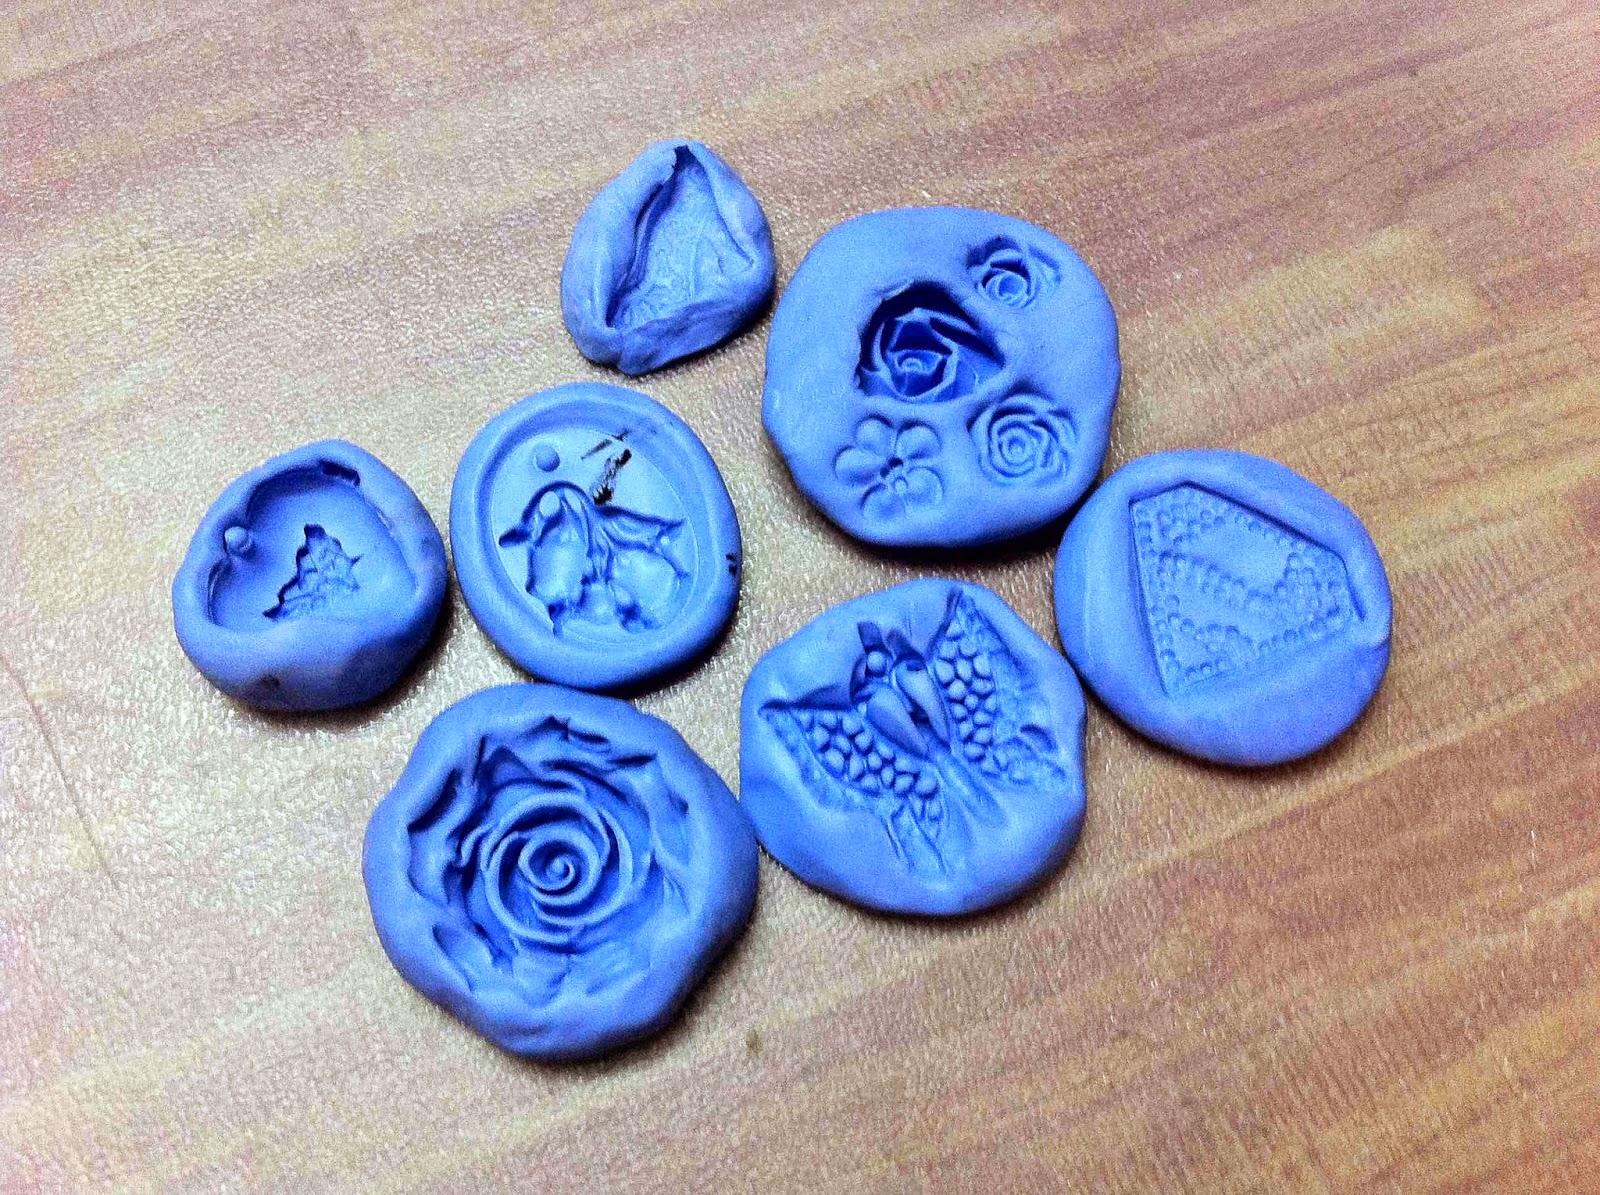 resin-handmade-jewelry-mold-malaysia